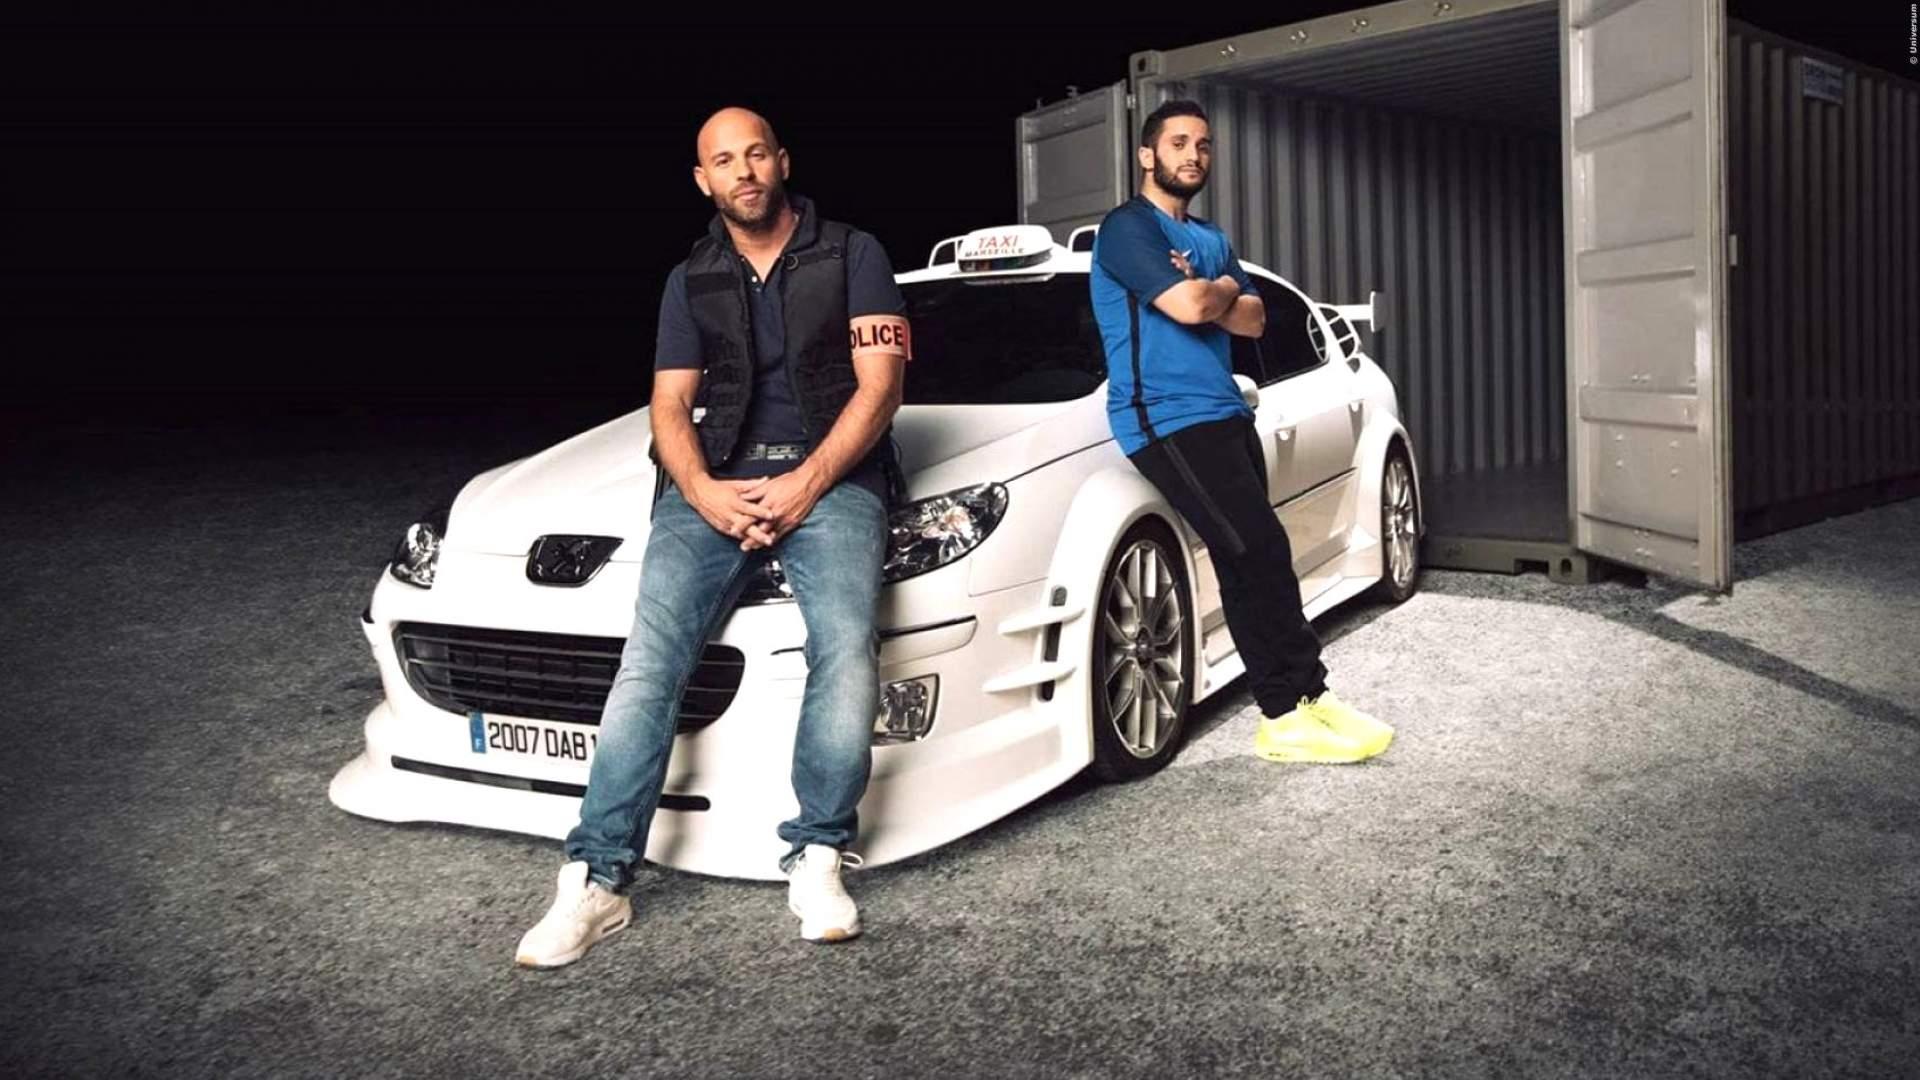 taxi 5 erster deutscher trailer zur fast and furious. Black Bedroom Furniture Sets. Home Design Ideas